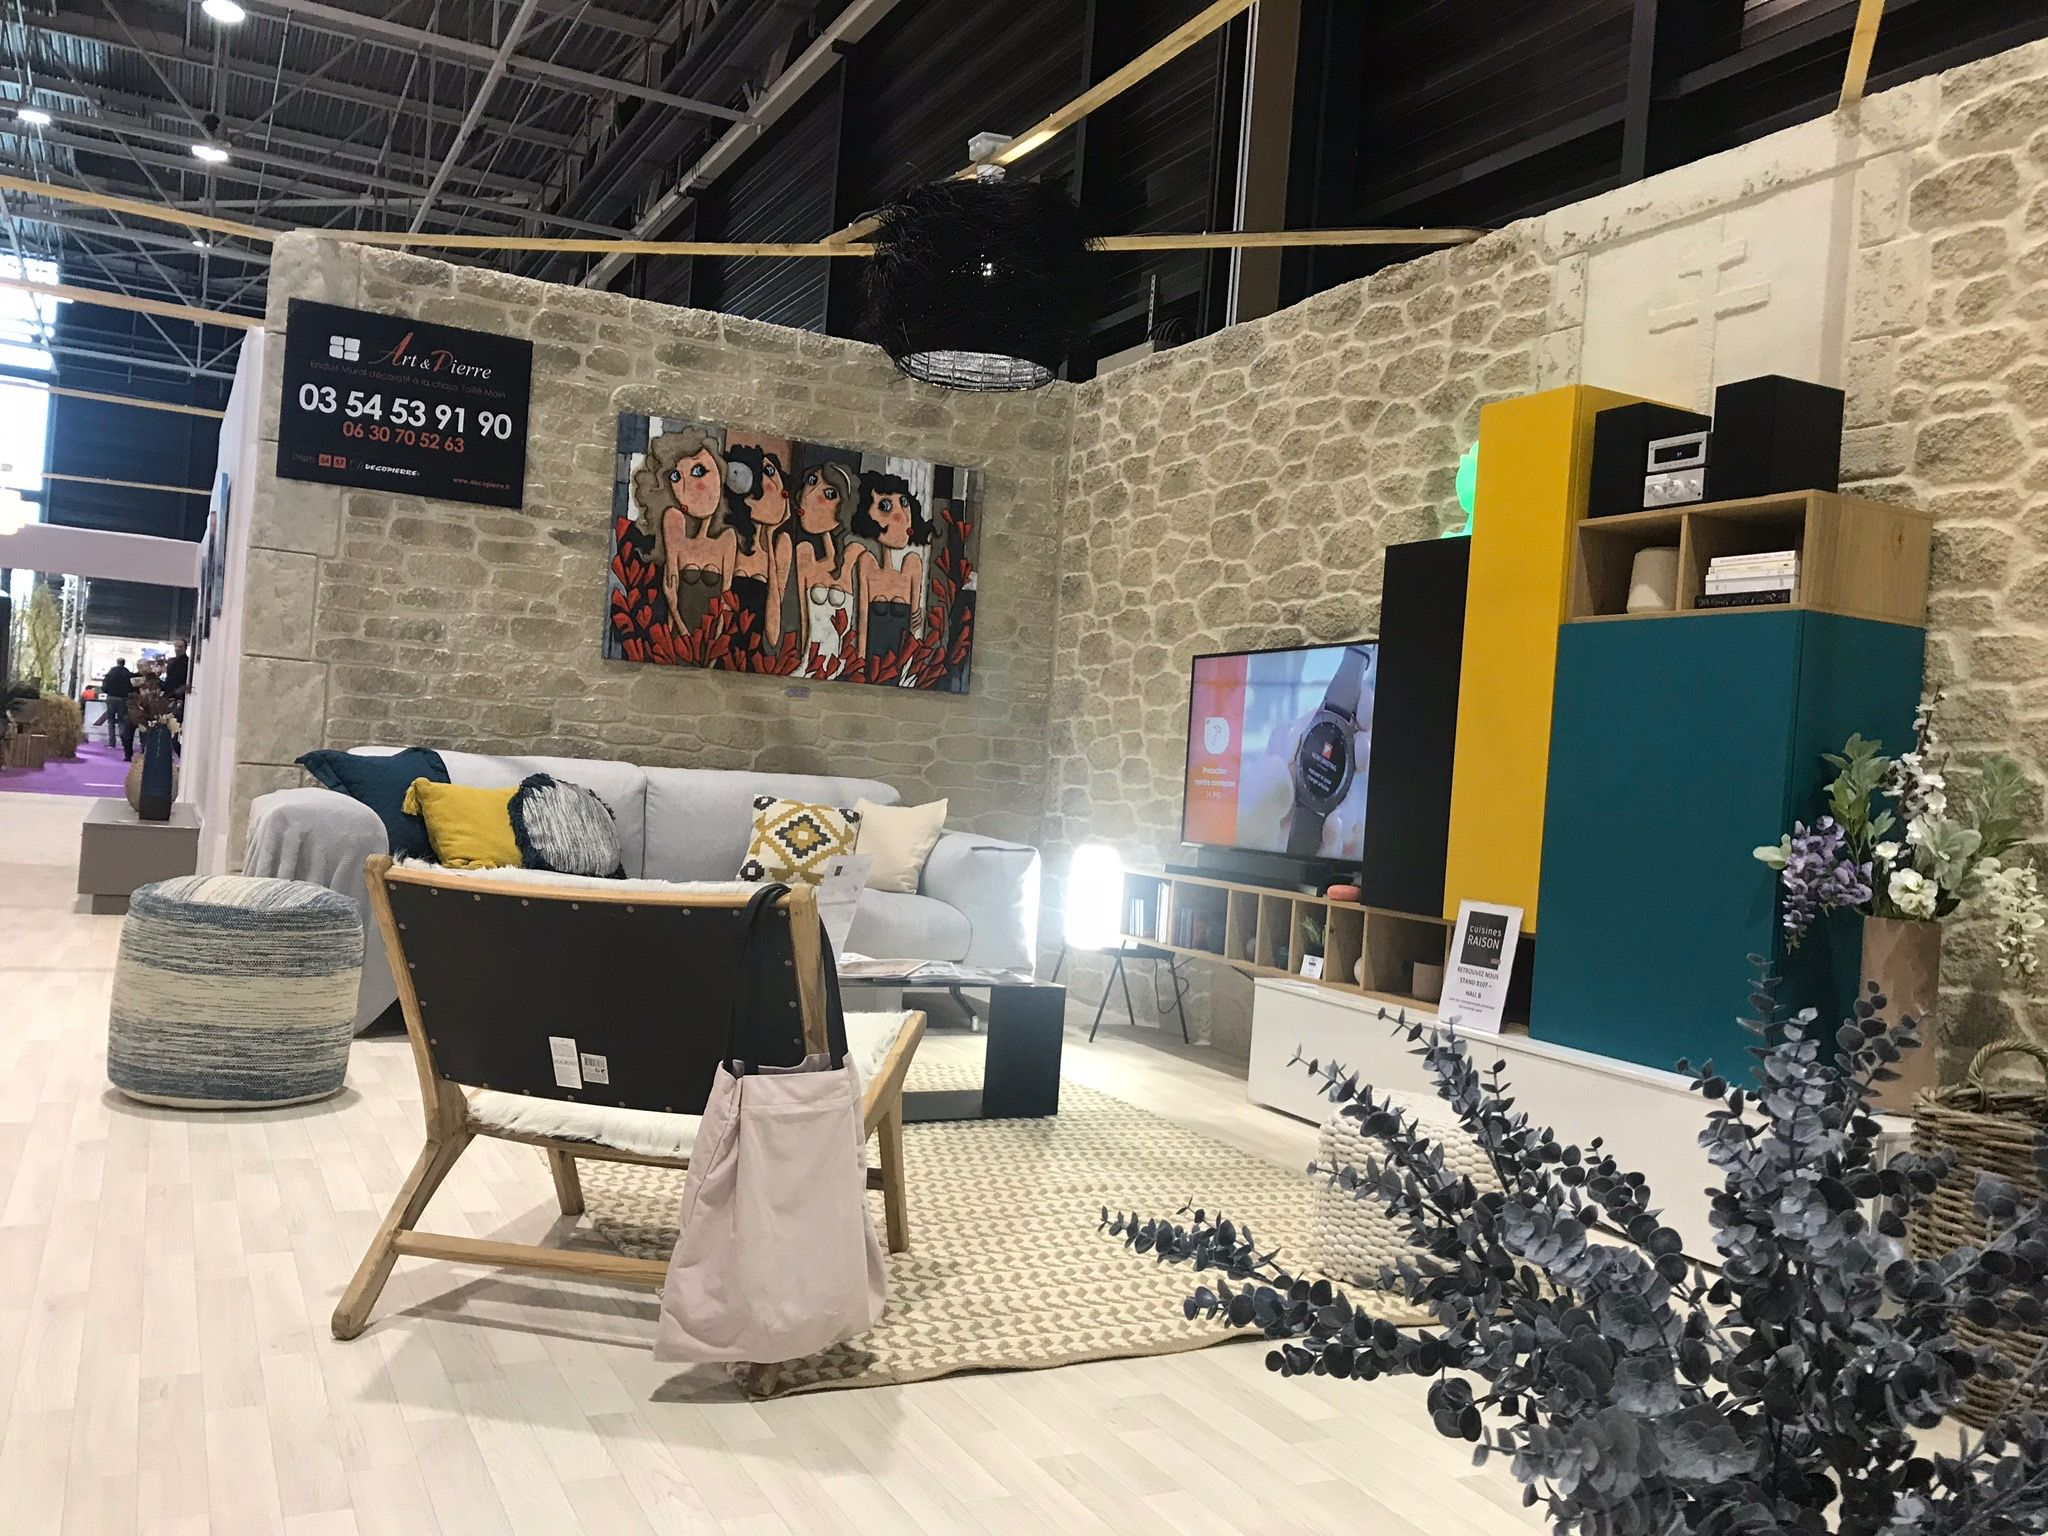 Epingle Par Karo Sur Salon De L Habitat Metz Expo Habitat Salon Expo